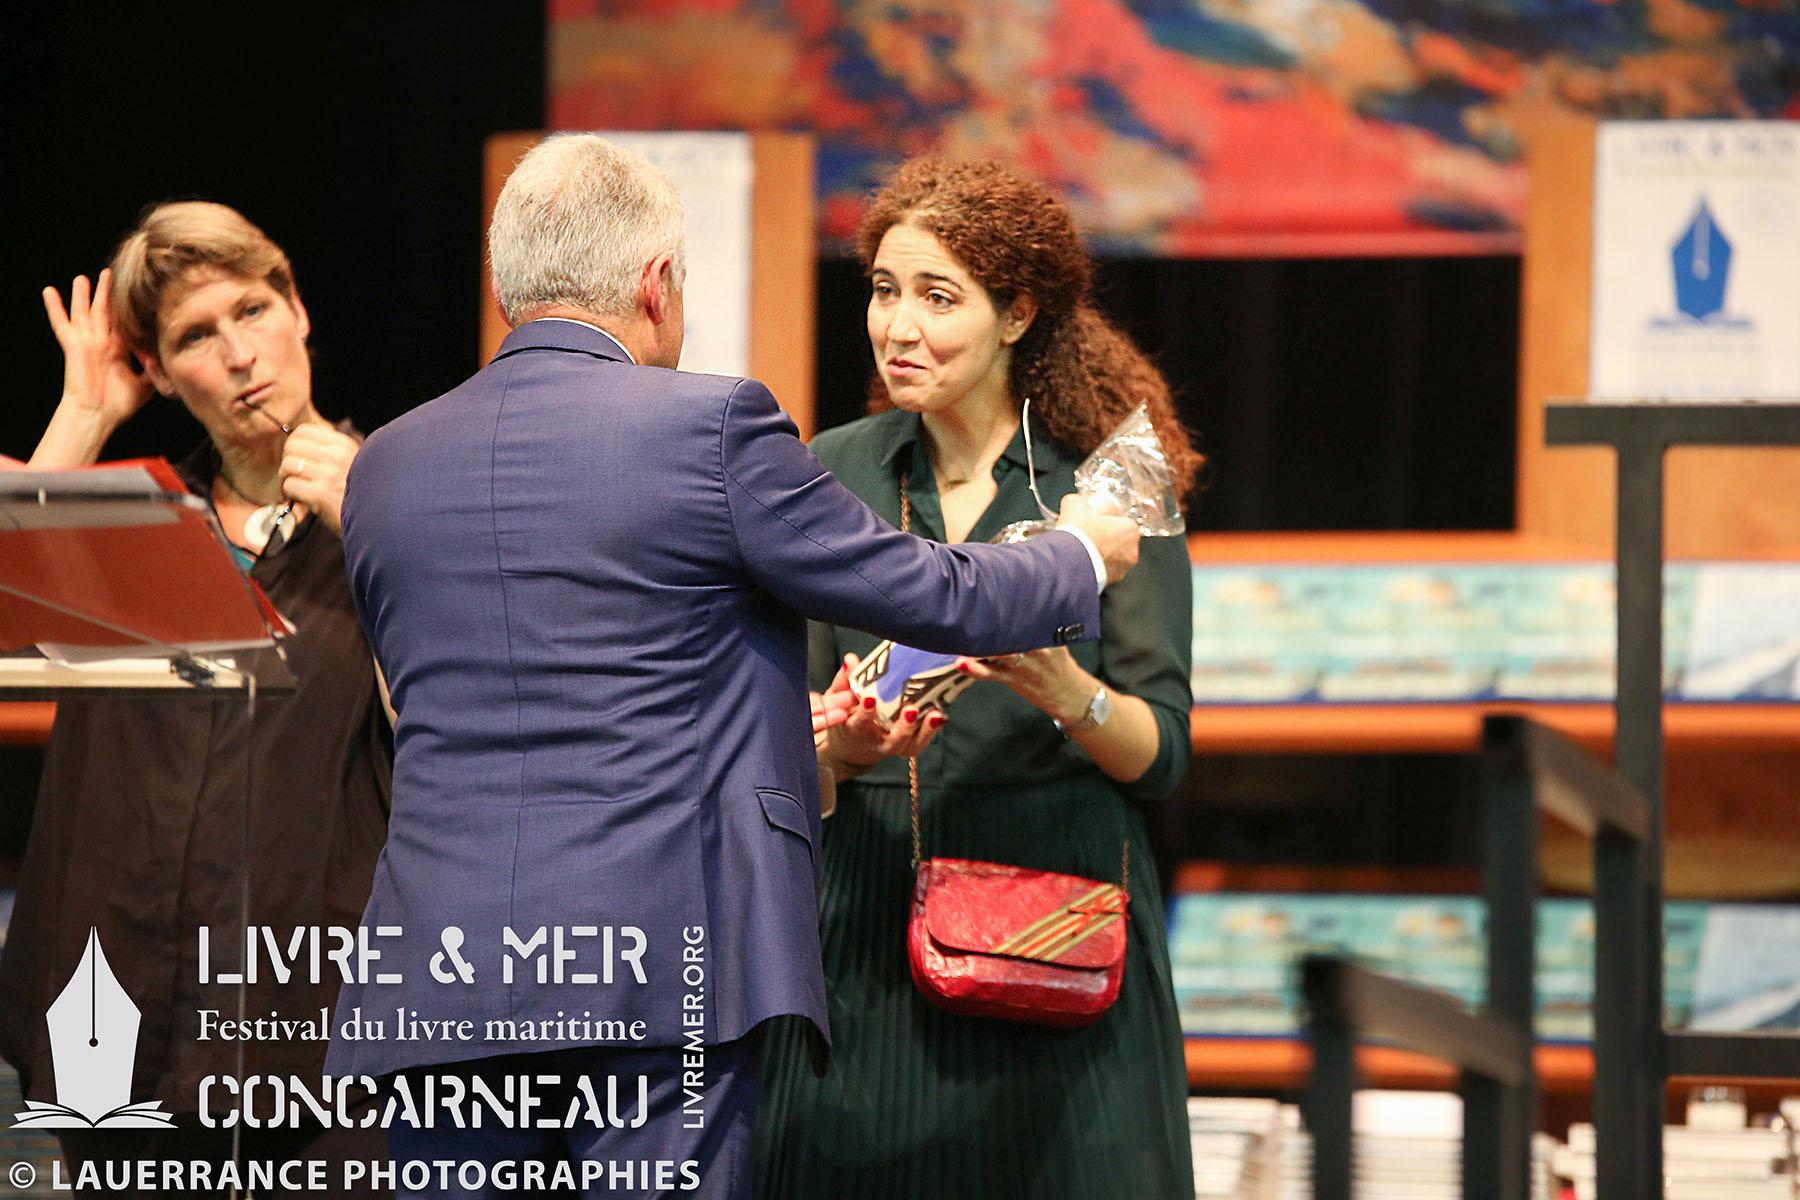 André Fidelin & Angelina Meslem © Lauerrance Photographies